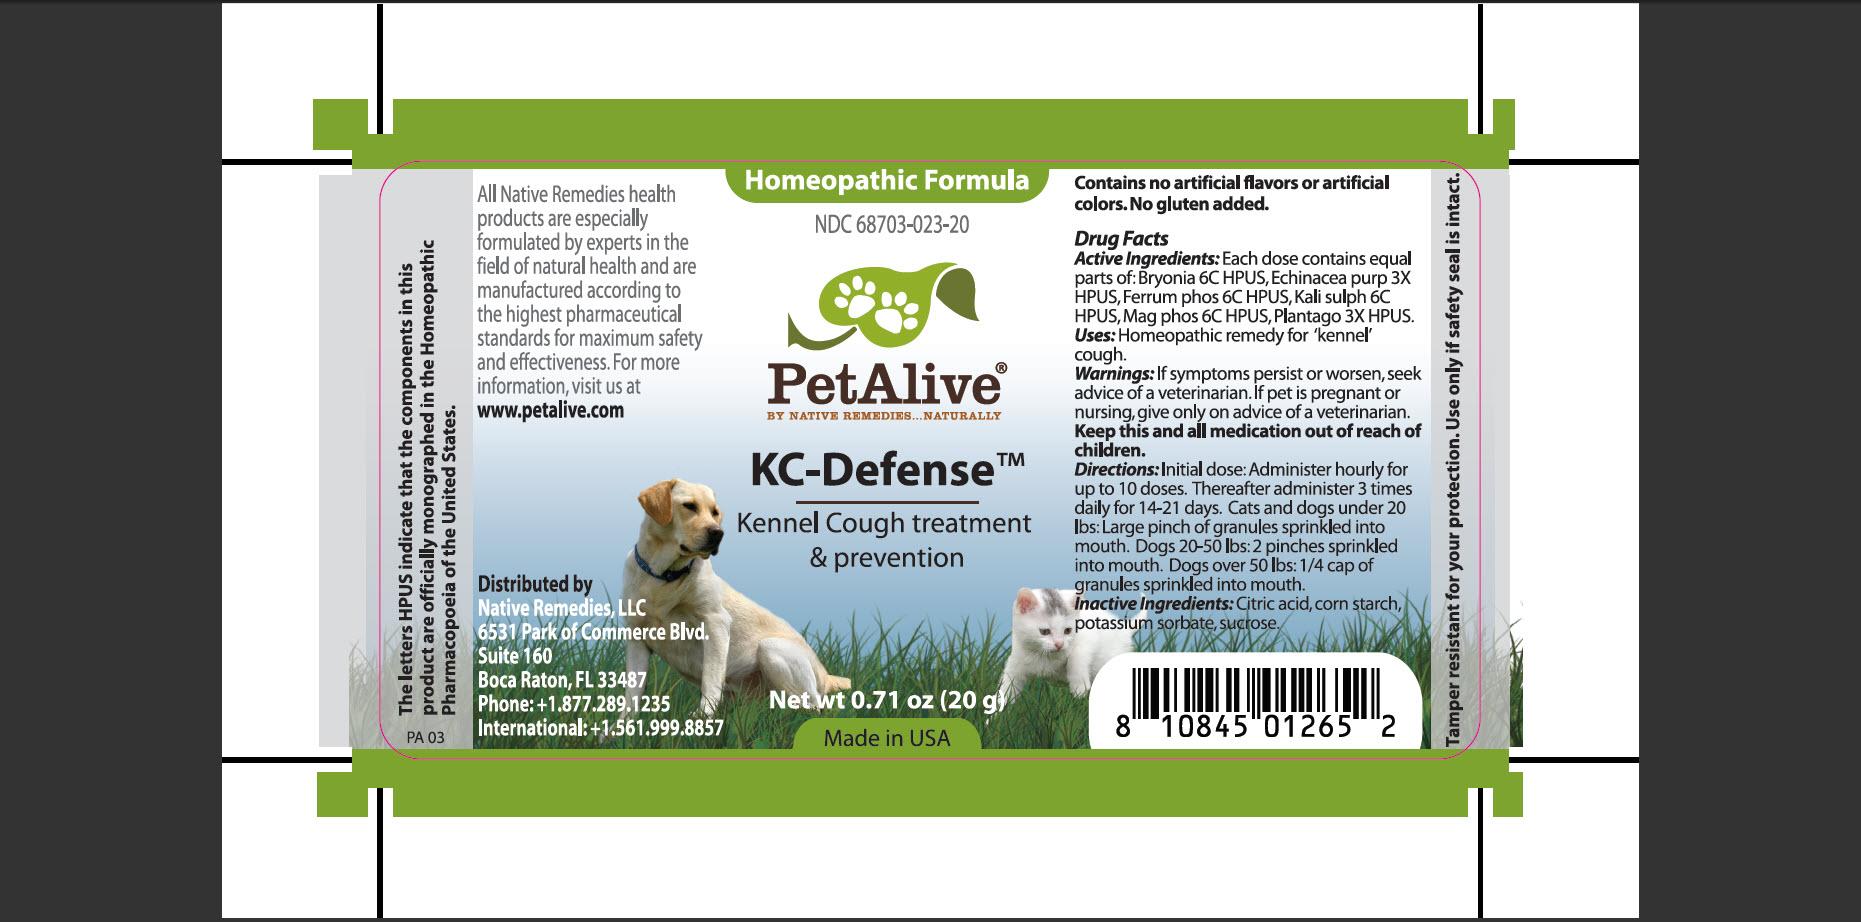 Petalive Kc-defense (Bryonia, Echinacea Purp, Ferrum Phos, Kali Sulph, Mag Phos, Plantago) Granule [Native Remedies, Llc]